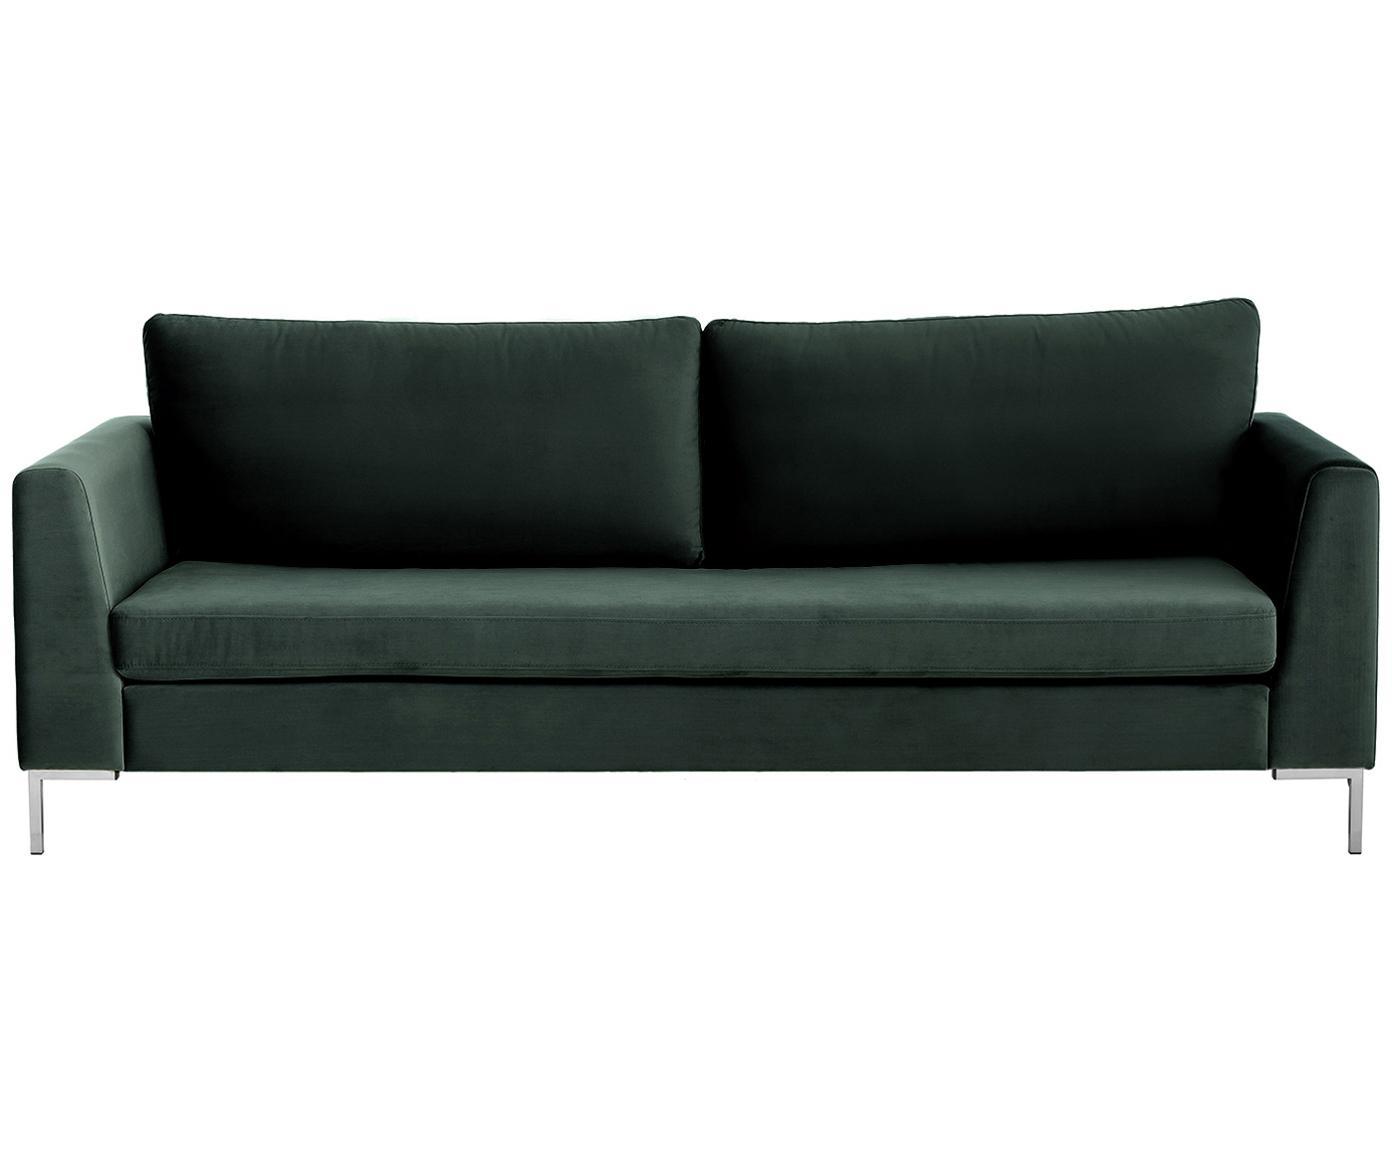 Samt-Sofa Luna (3-Sitzer), Bezug: Samt (Polyester) 80.000 S, Gestell: Massives Buchenholz, Füße: Metall, galvanisiert, Samt Dunkelgrün, Silber, B 230 x T 95 cm